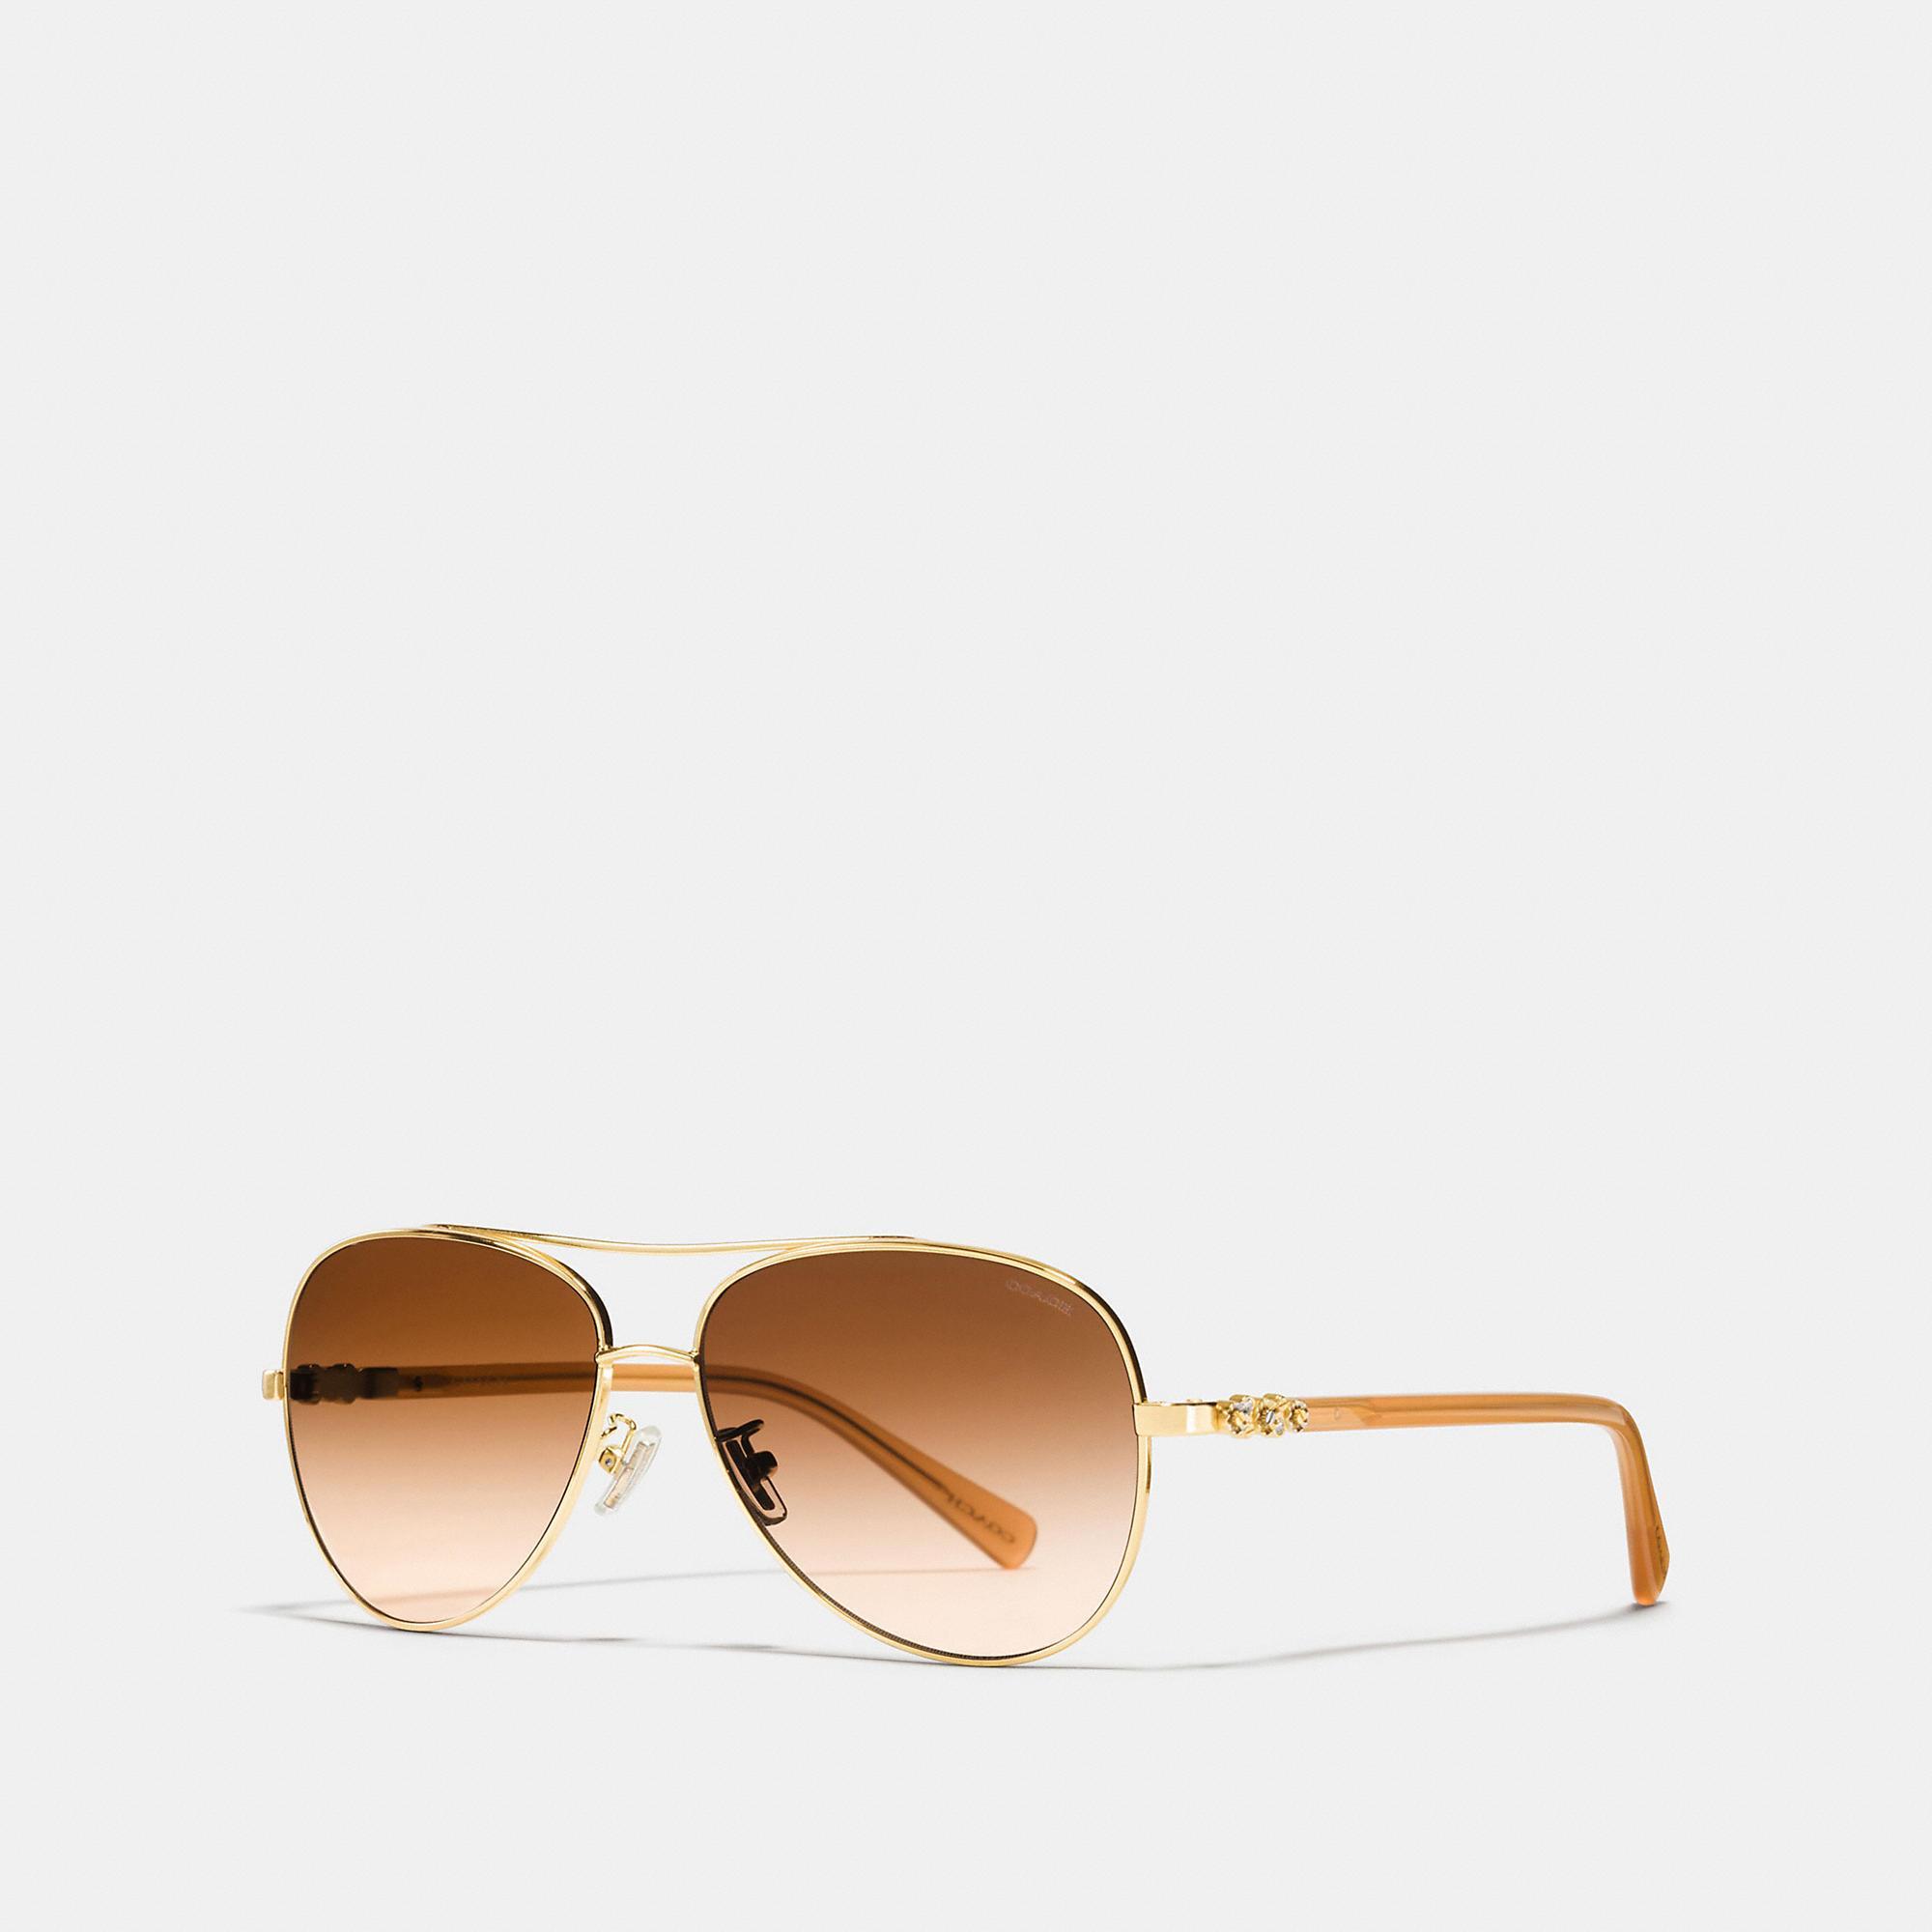 Coach Daisy Rivet Pilot Sunglasses In Gold/amber